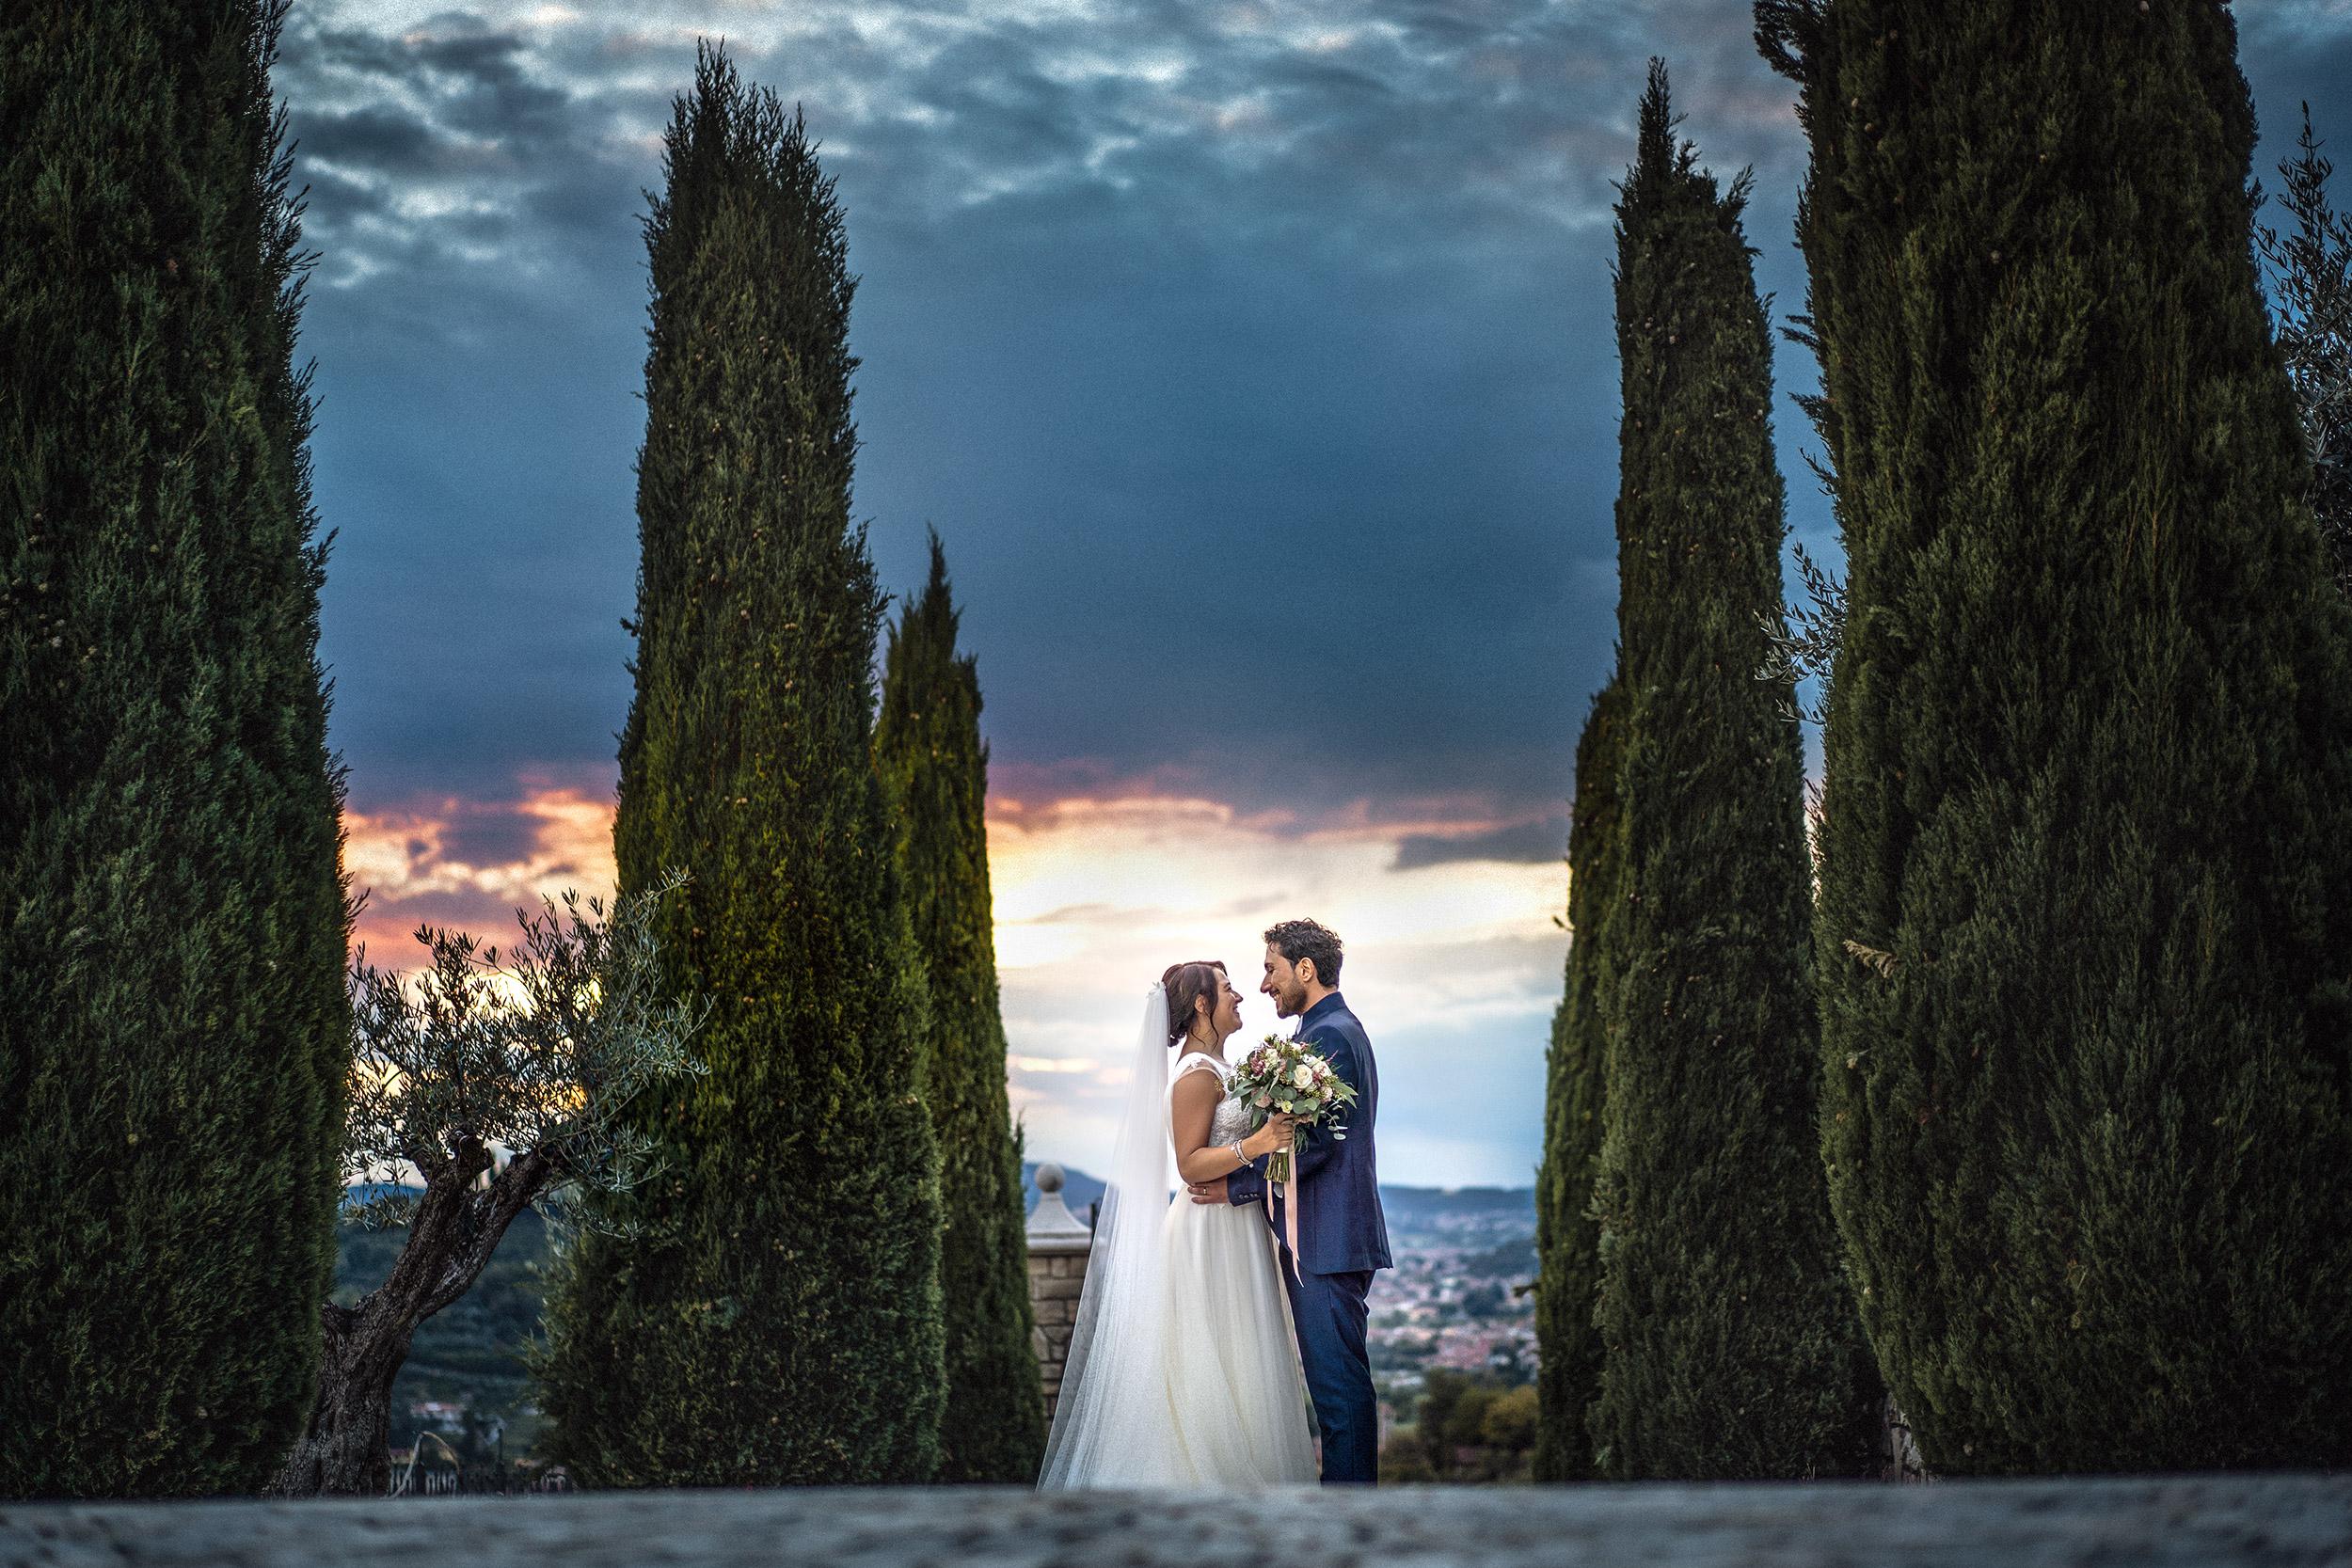 001 reportage sposi foto matrimonio wedding cantorie gussago bresci 1